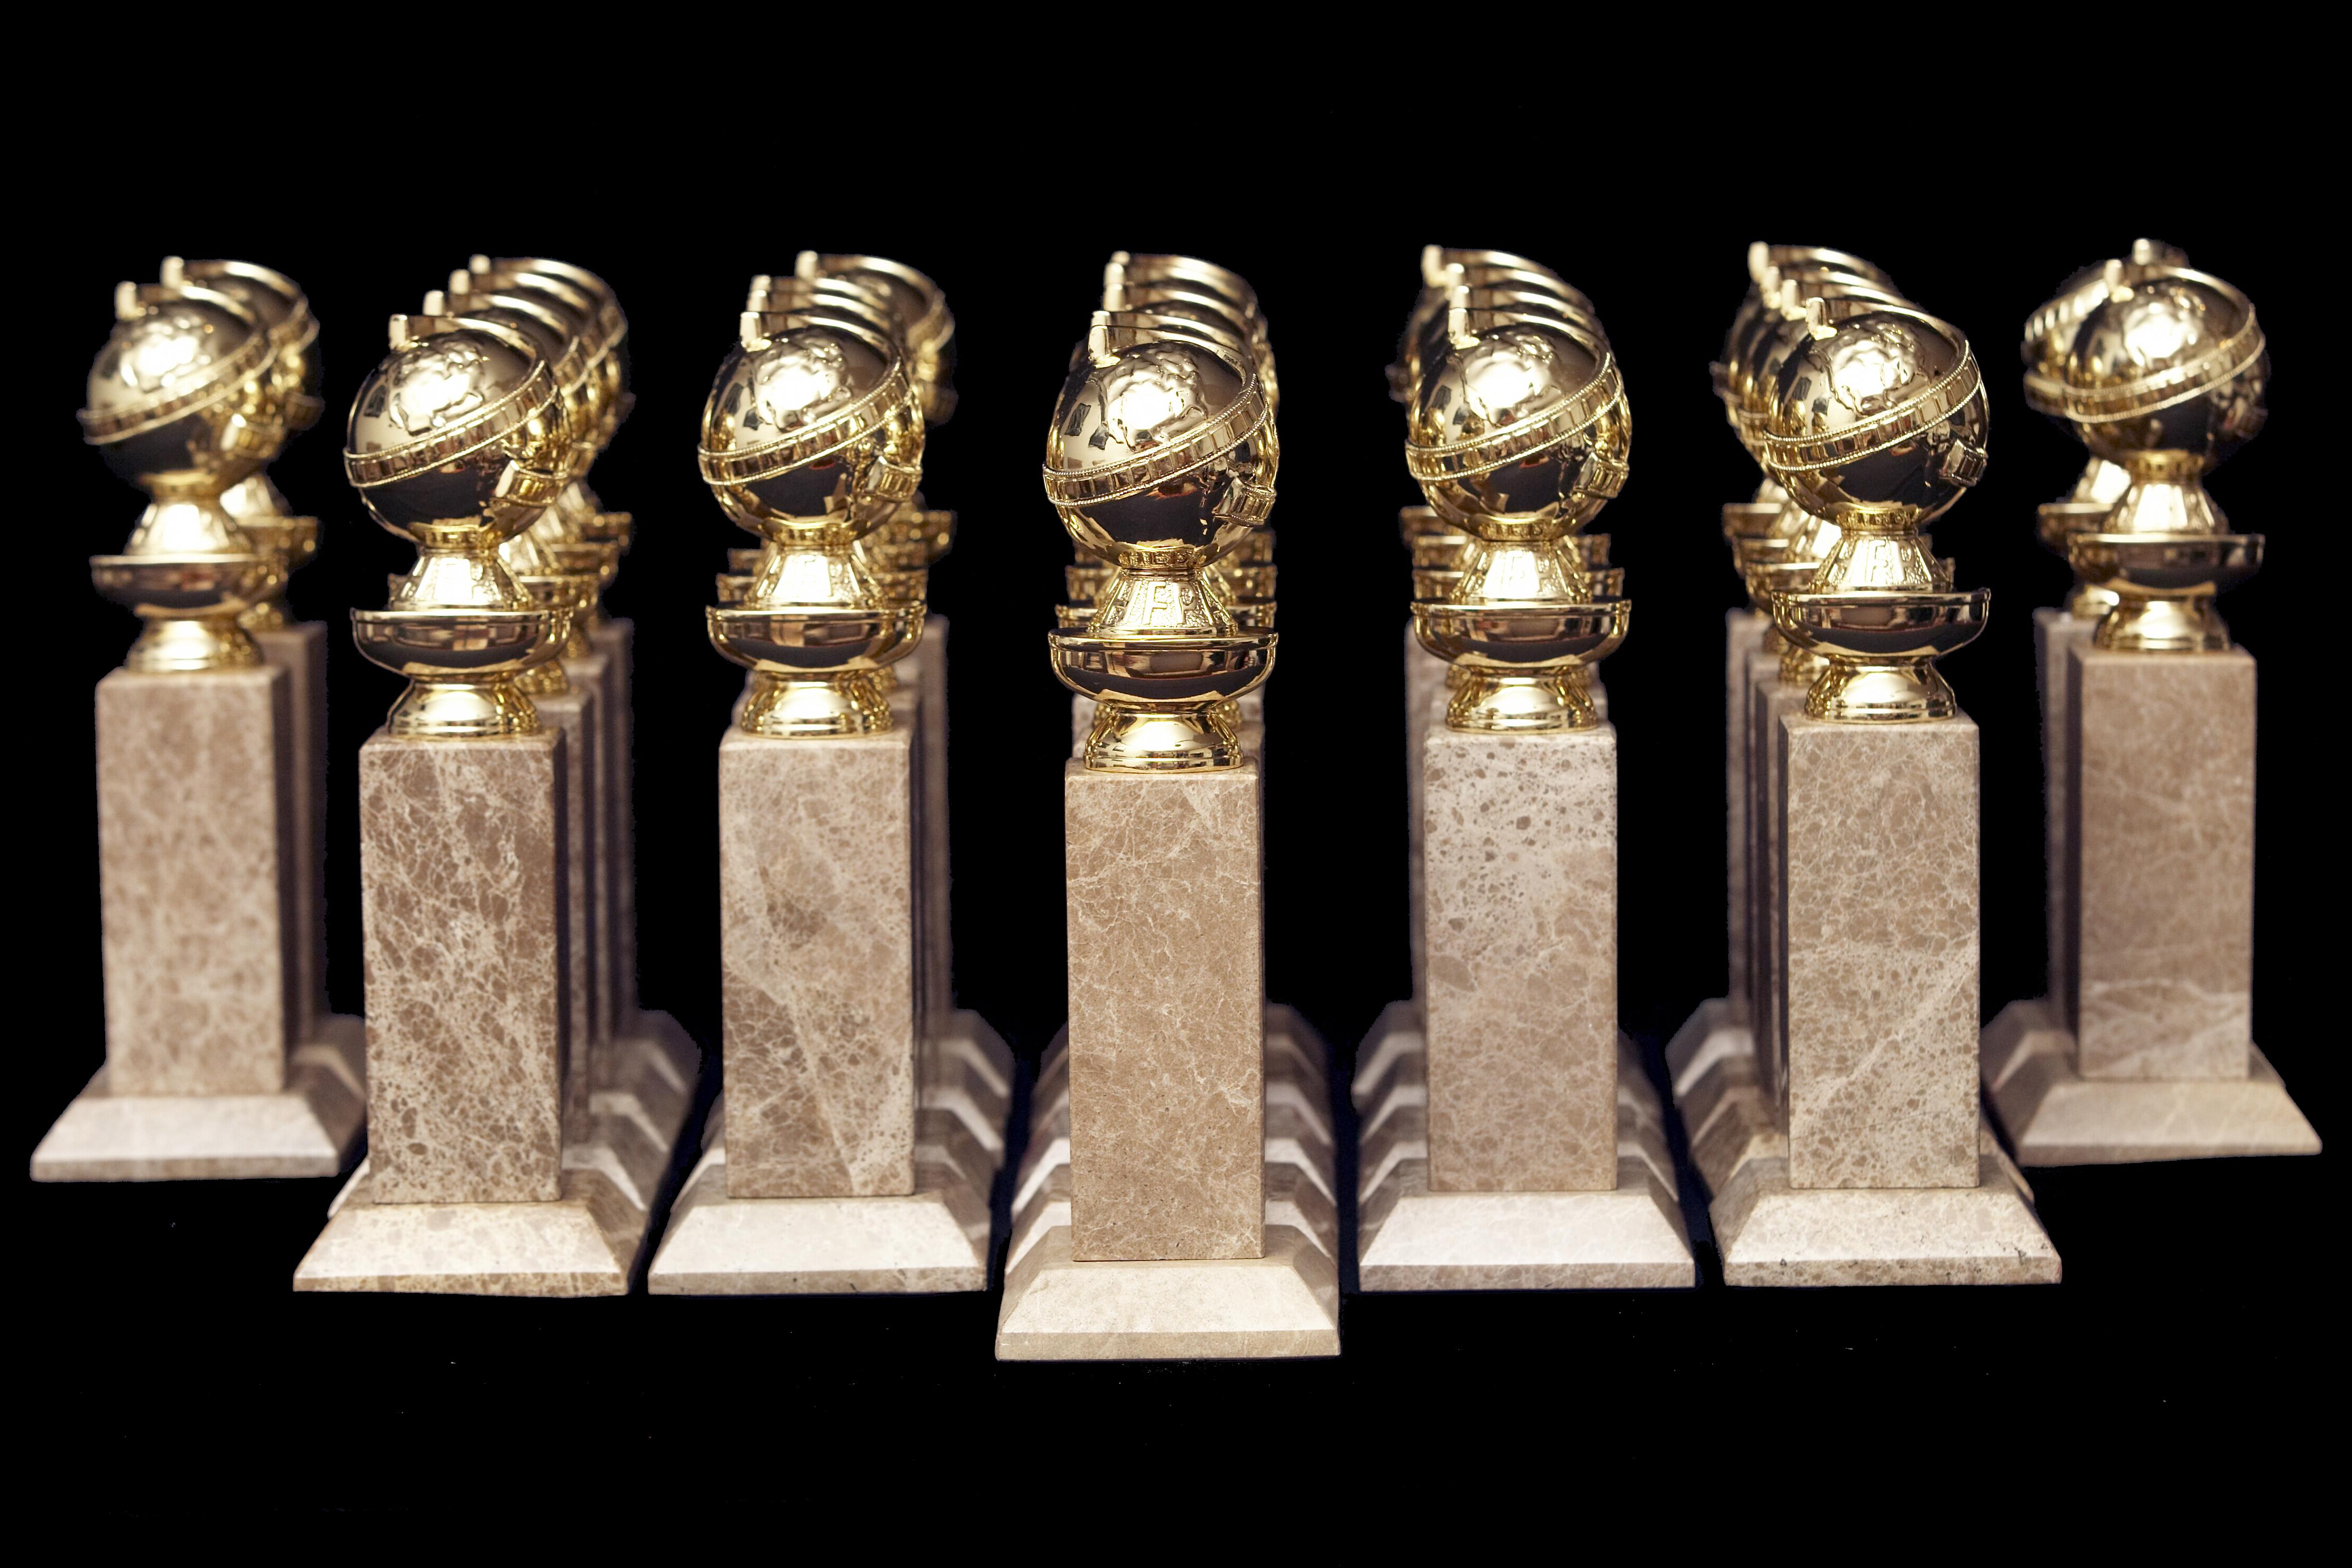 golden-globes-statutes-1